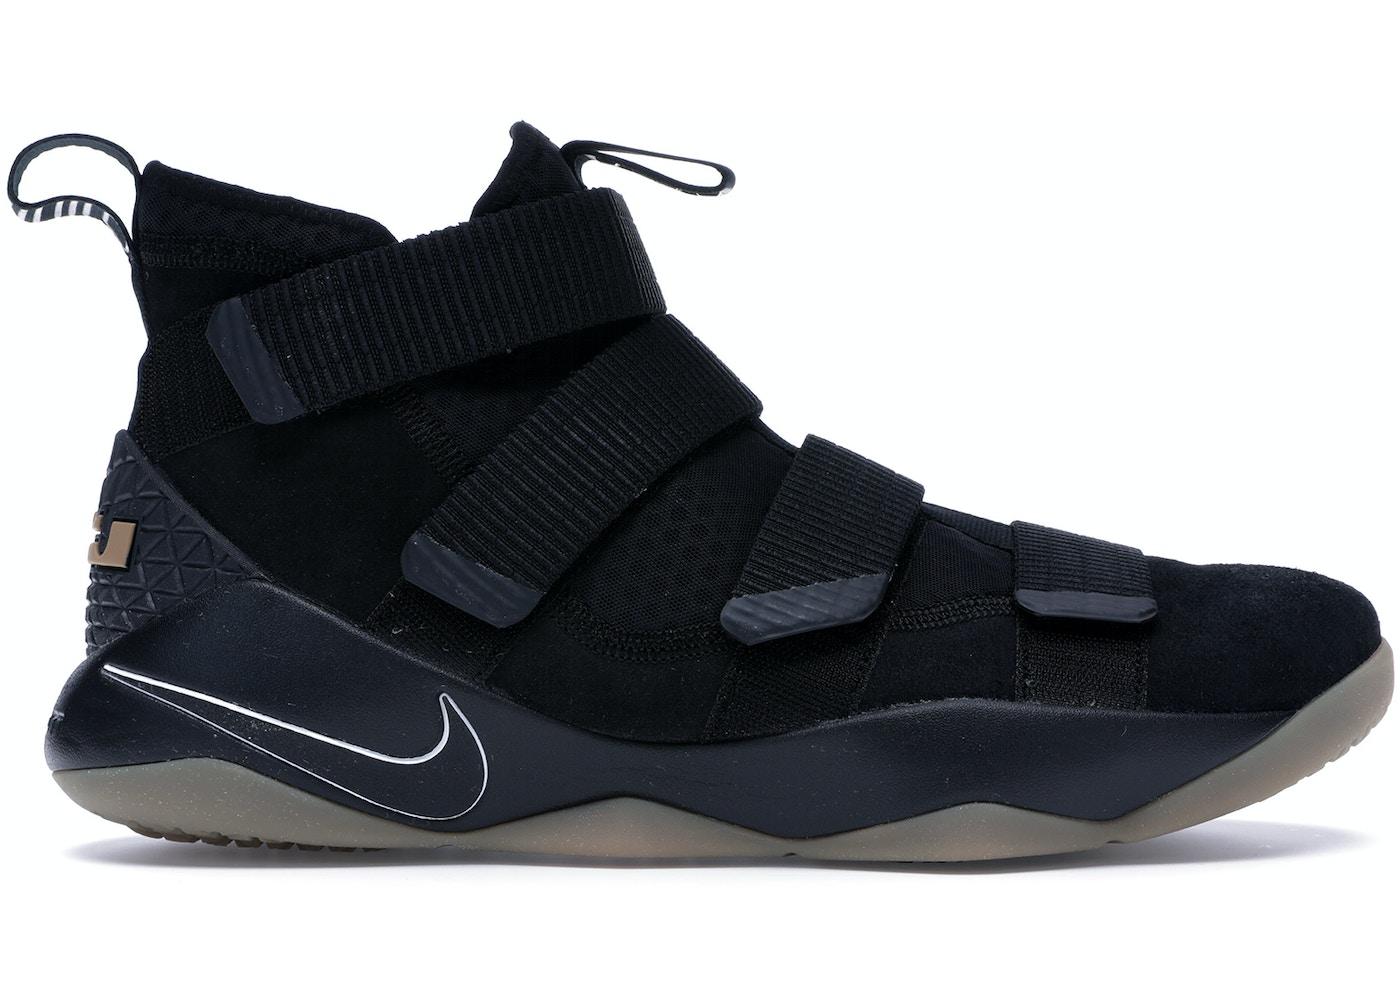 footwear watch great quality Nike LeBron Zoom Soldier 11 Black Gum - 897644-007